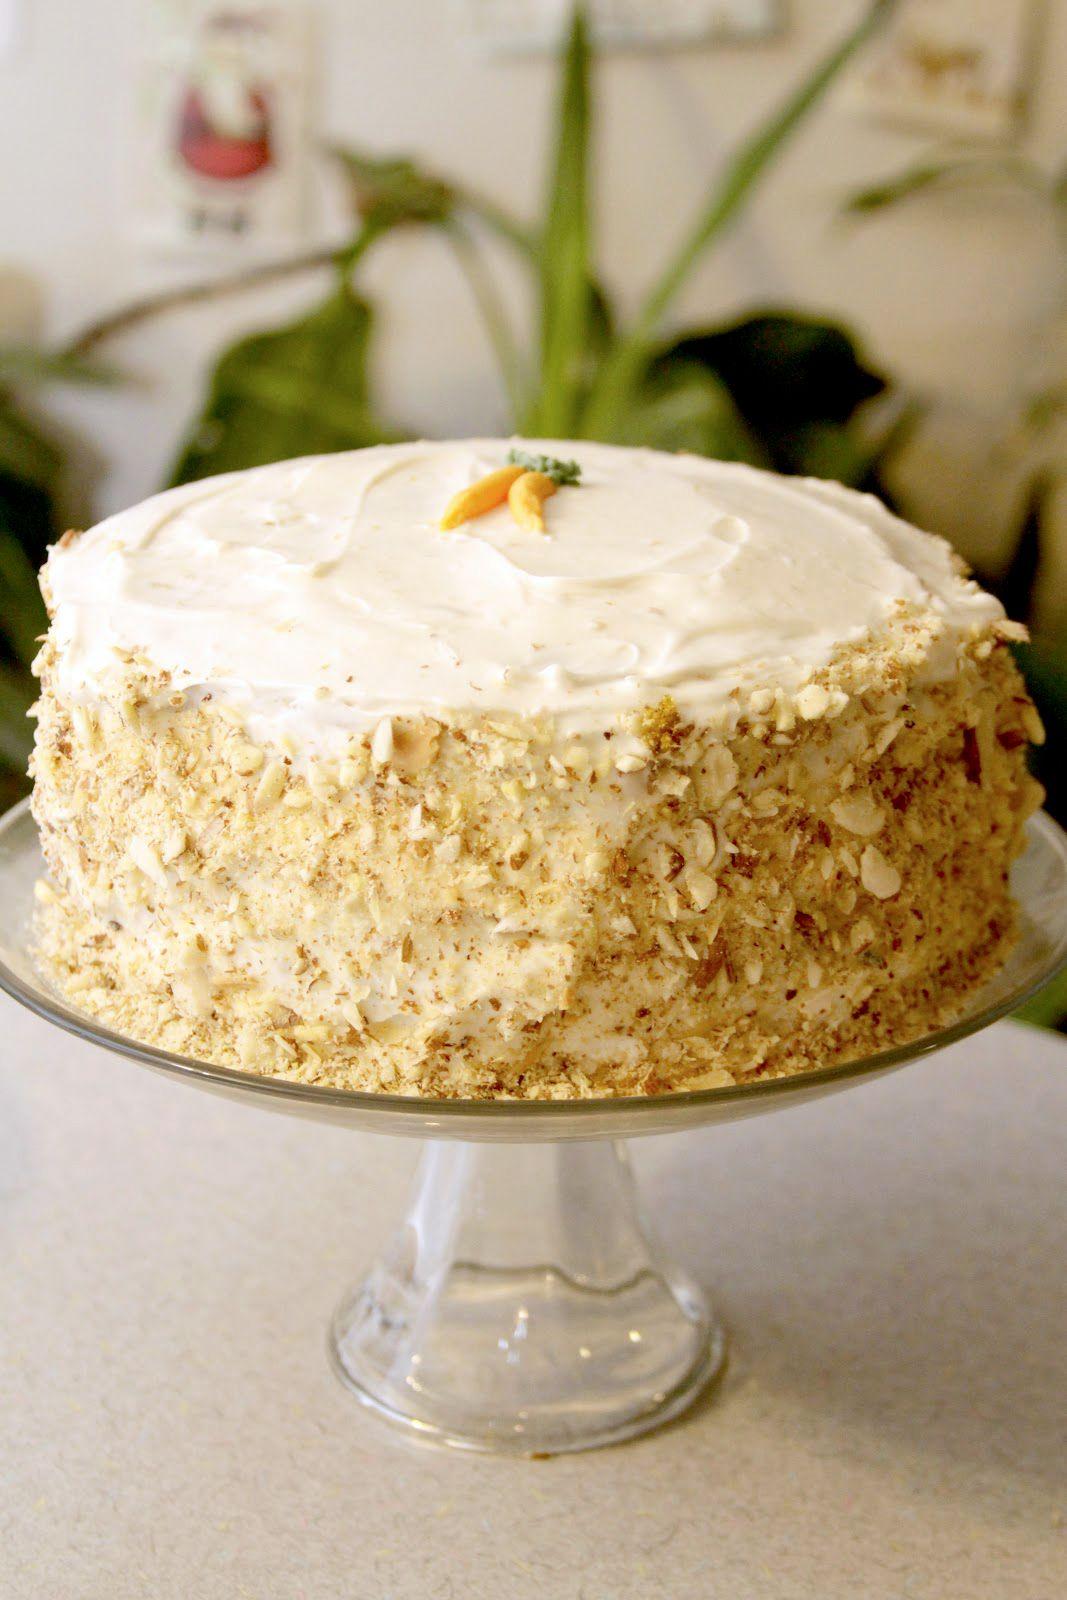 Vegan Carrot Cake Recipe My Favorite Using Chia Seed